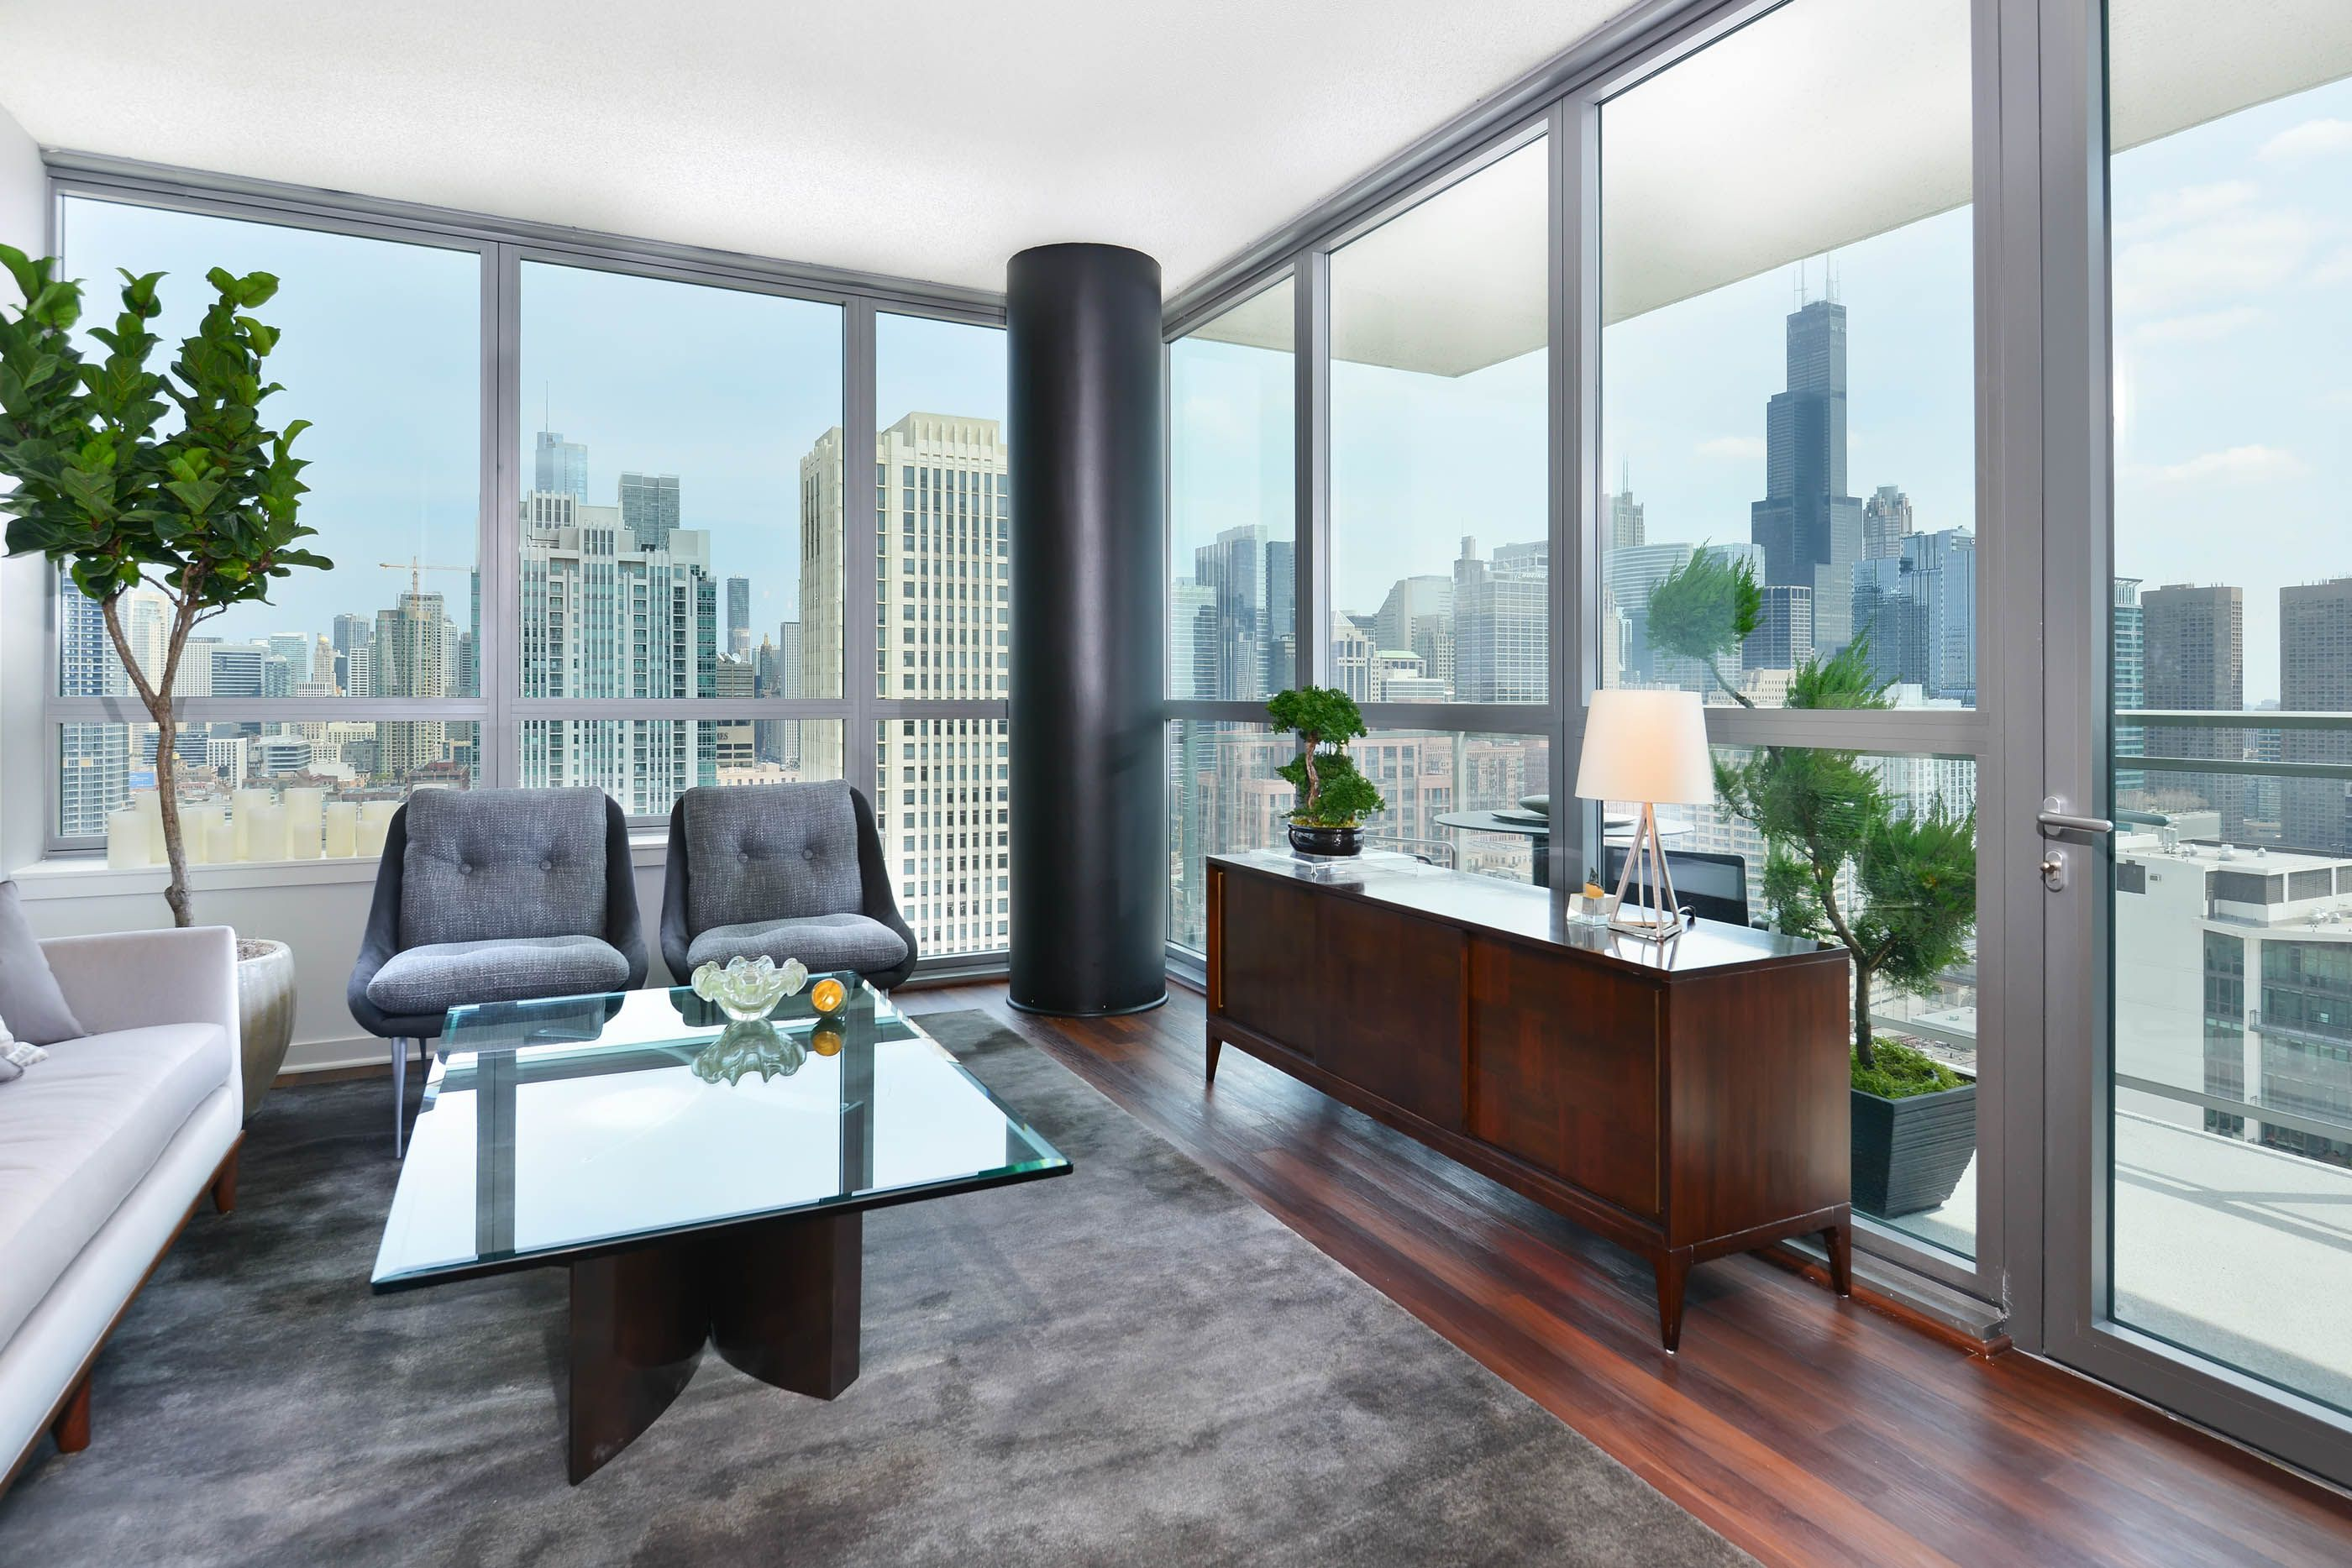 floor to ceiling windows in condos - Google Search